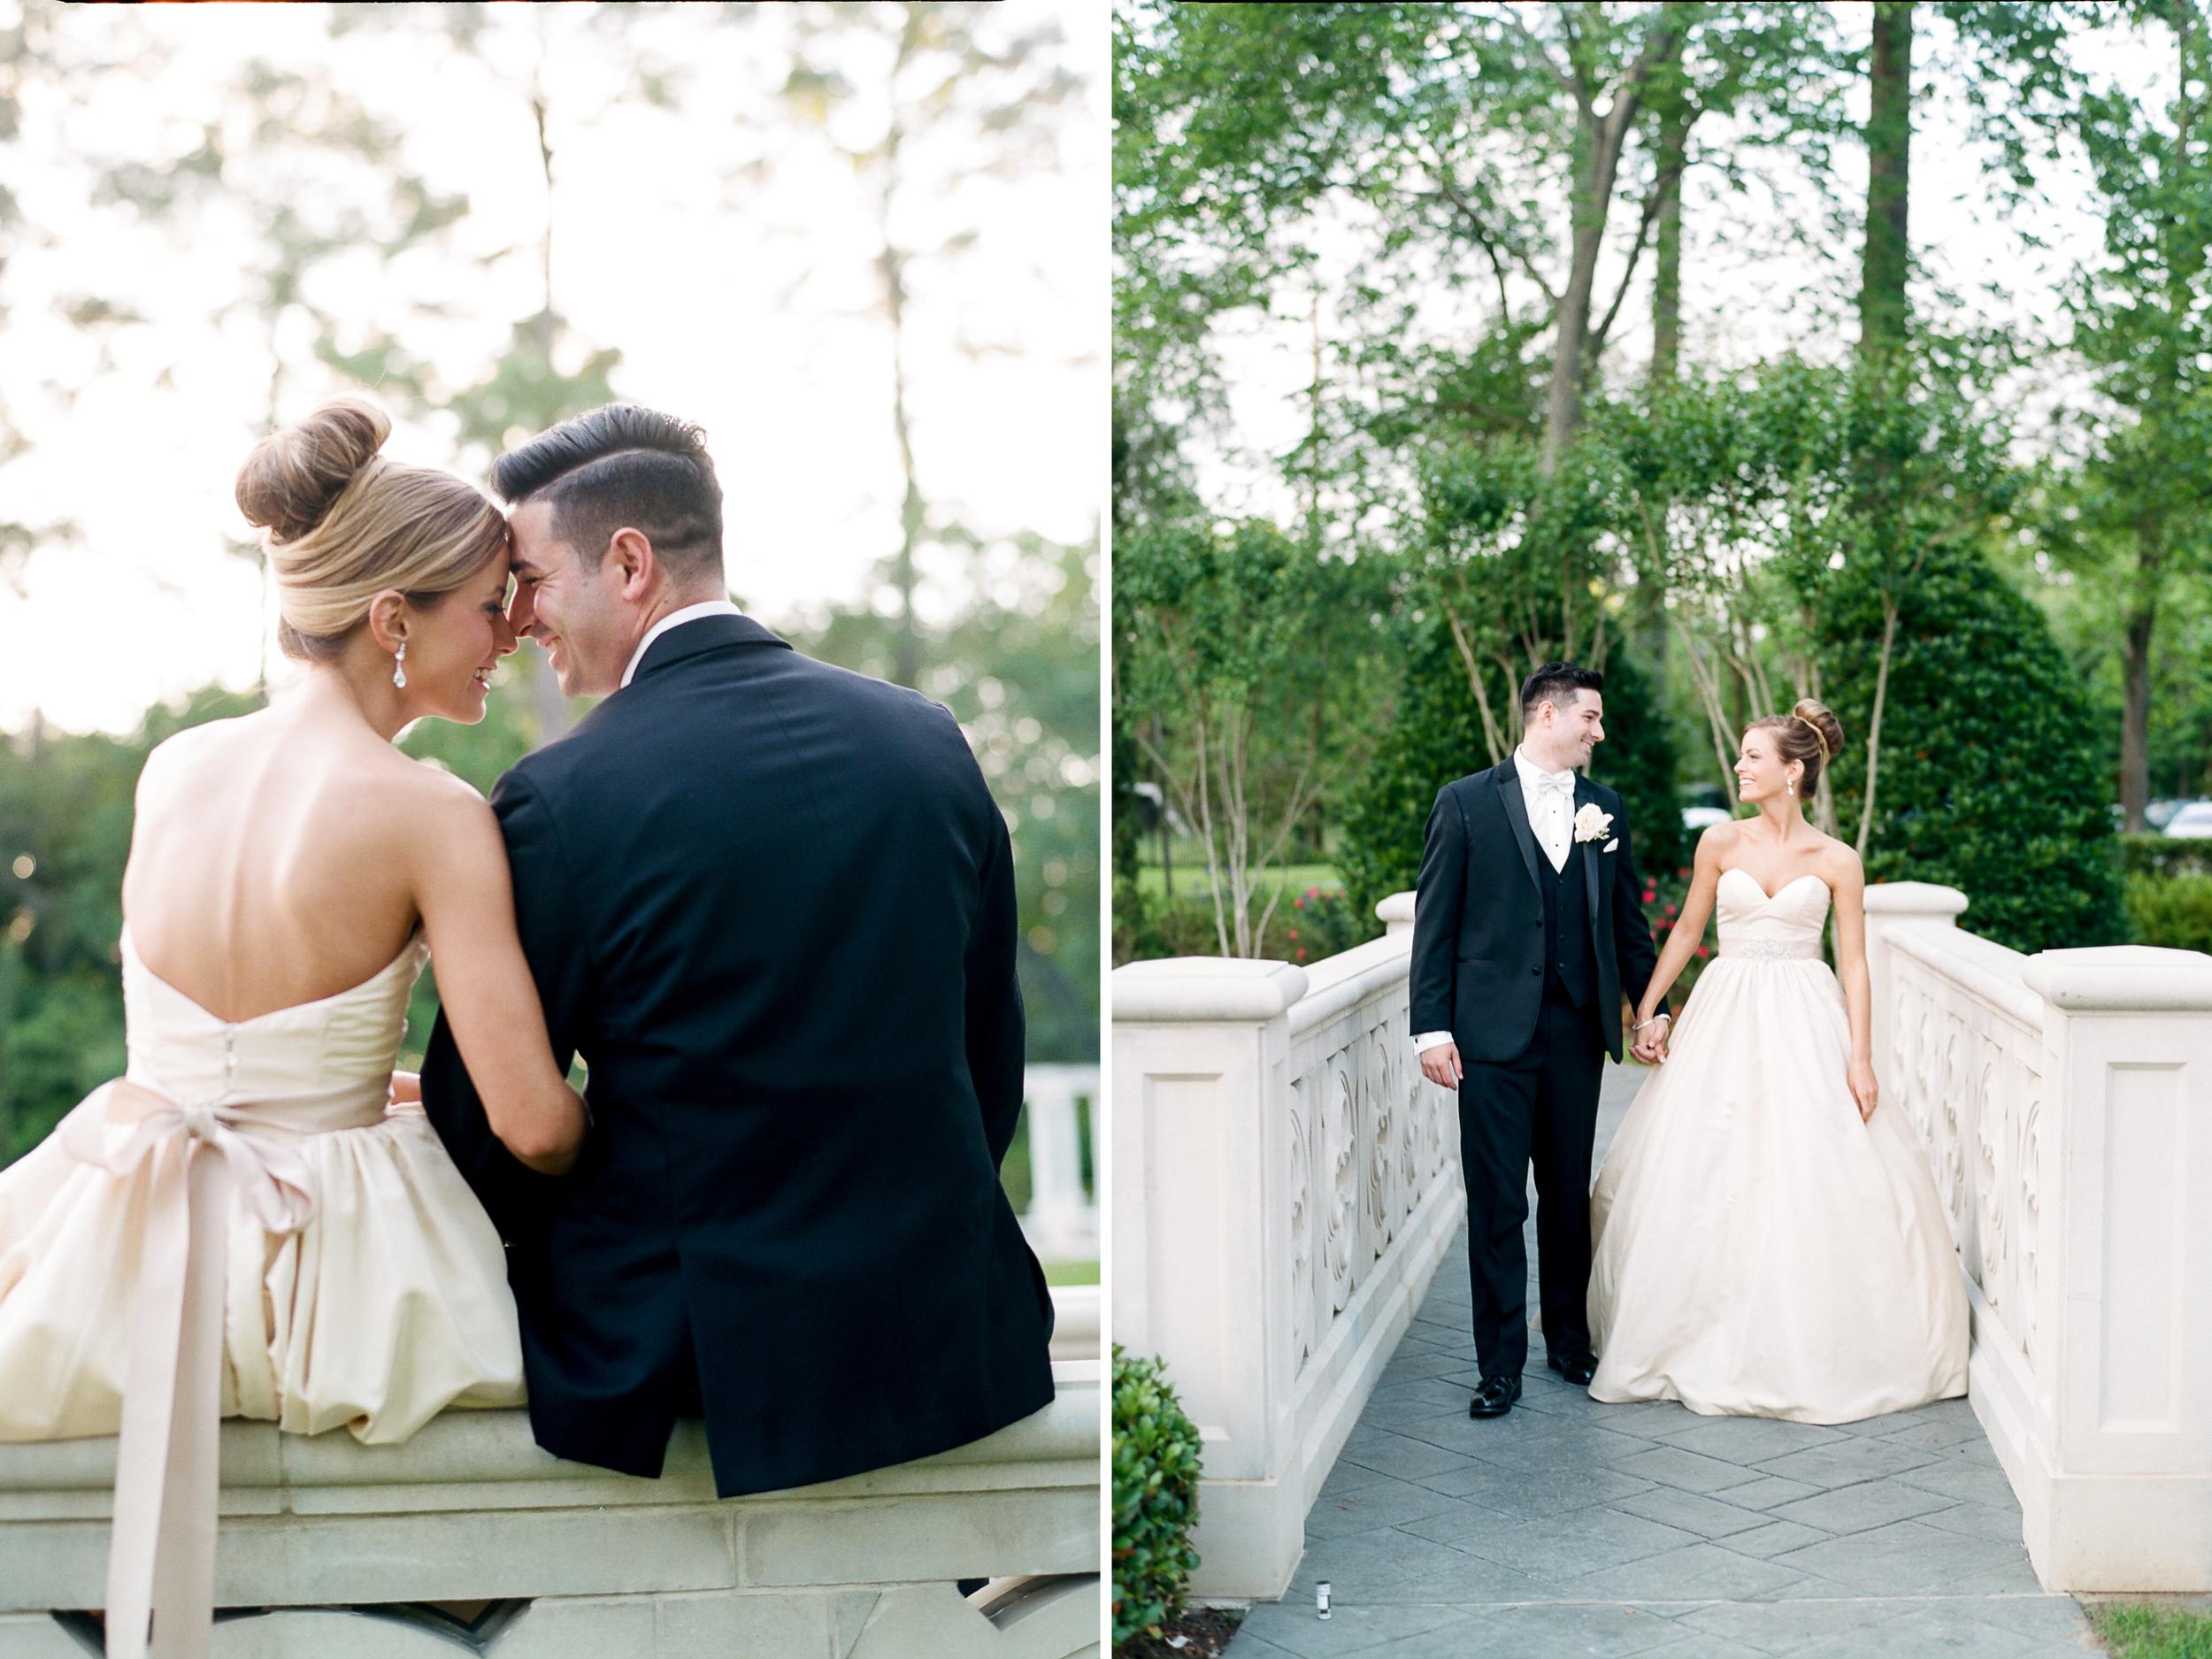 Dana-Fernandez-Photography-Houston-Wedding-Photographer-Style-Me-Pretty-Film-Texas-Destination-Photographer-145.jpg